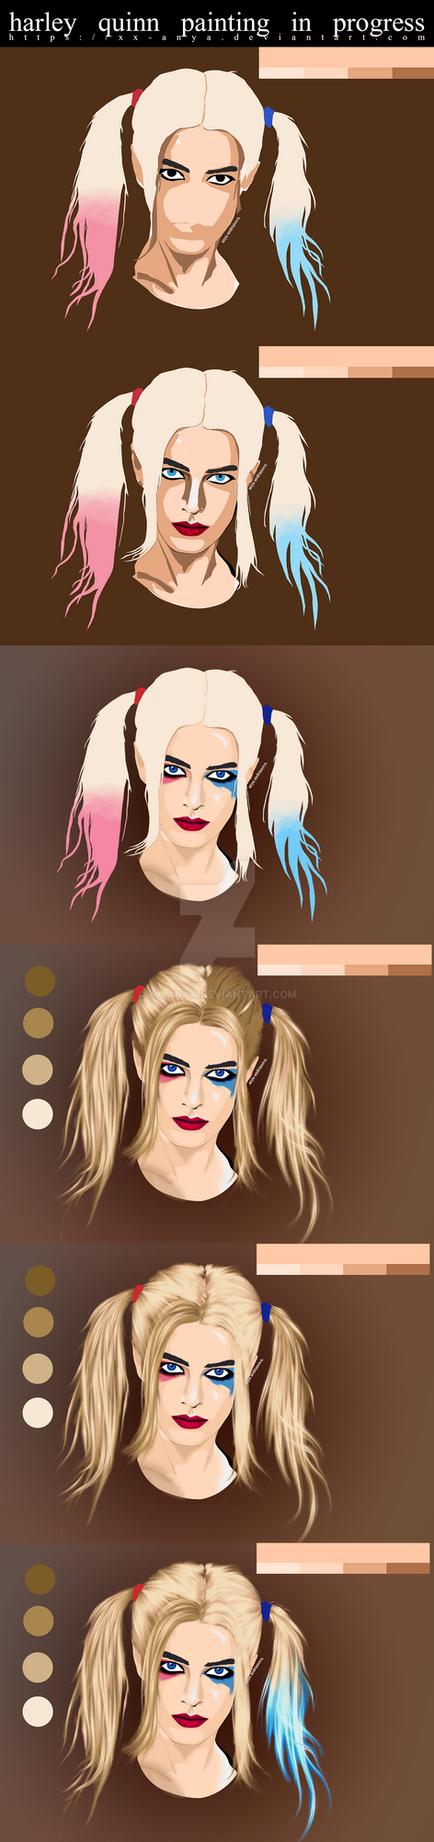 Harley Quinn, In Progress by xx-Anya